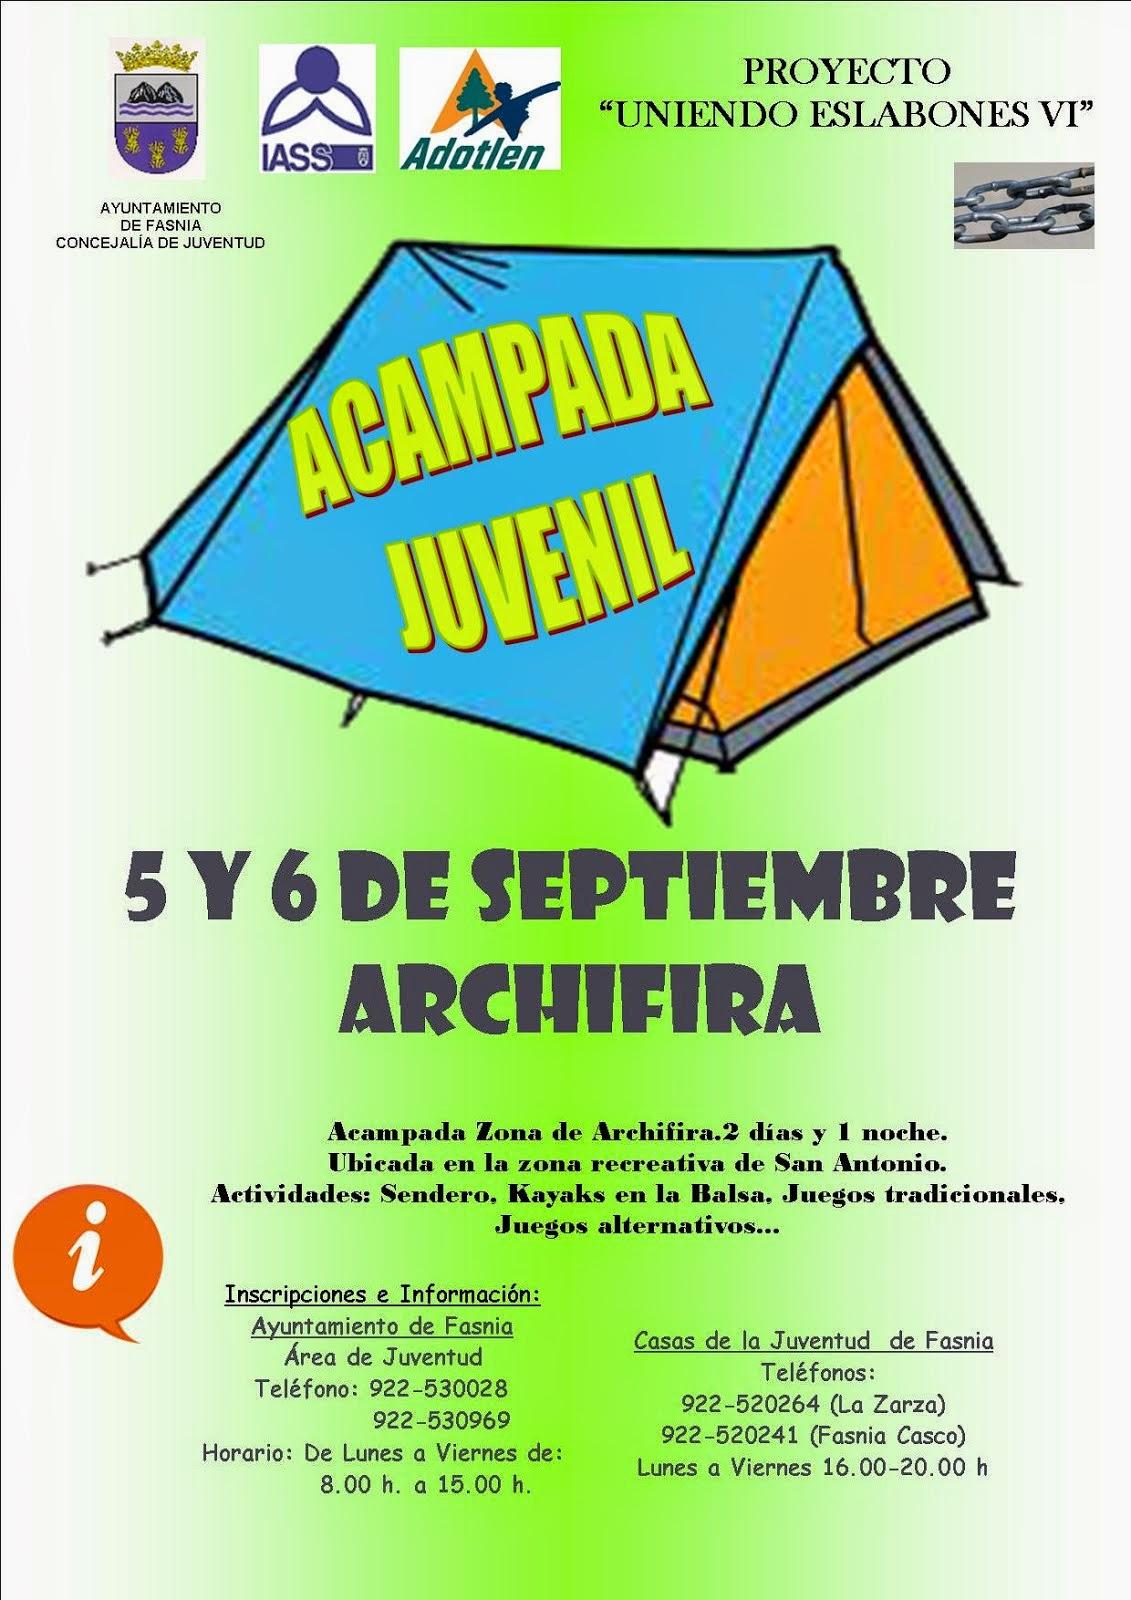 ACAMPADA JUVENIL